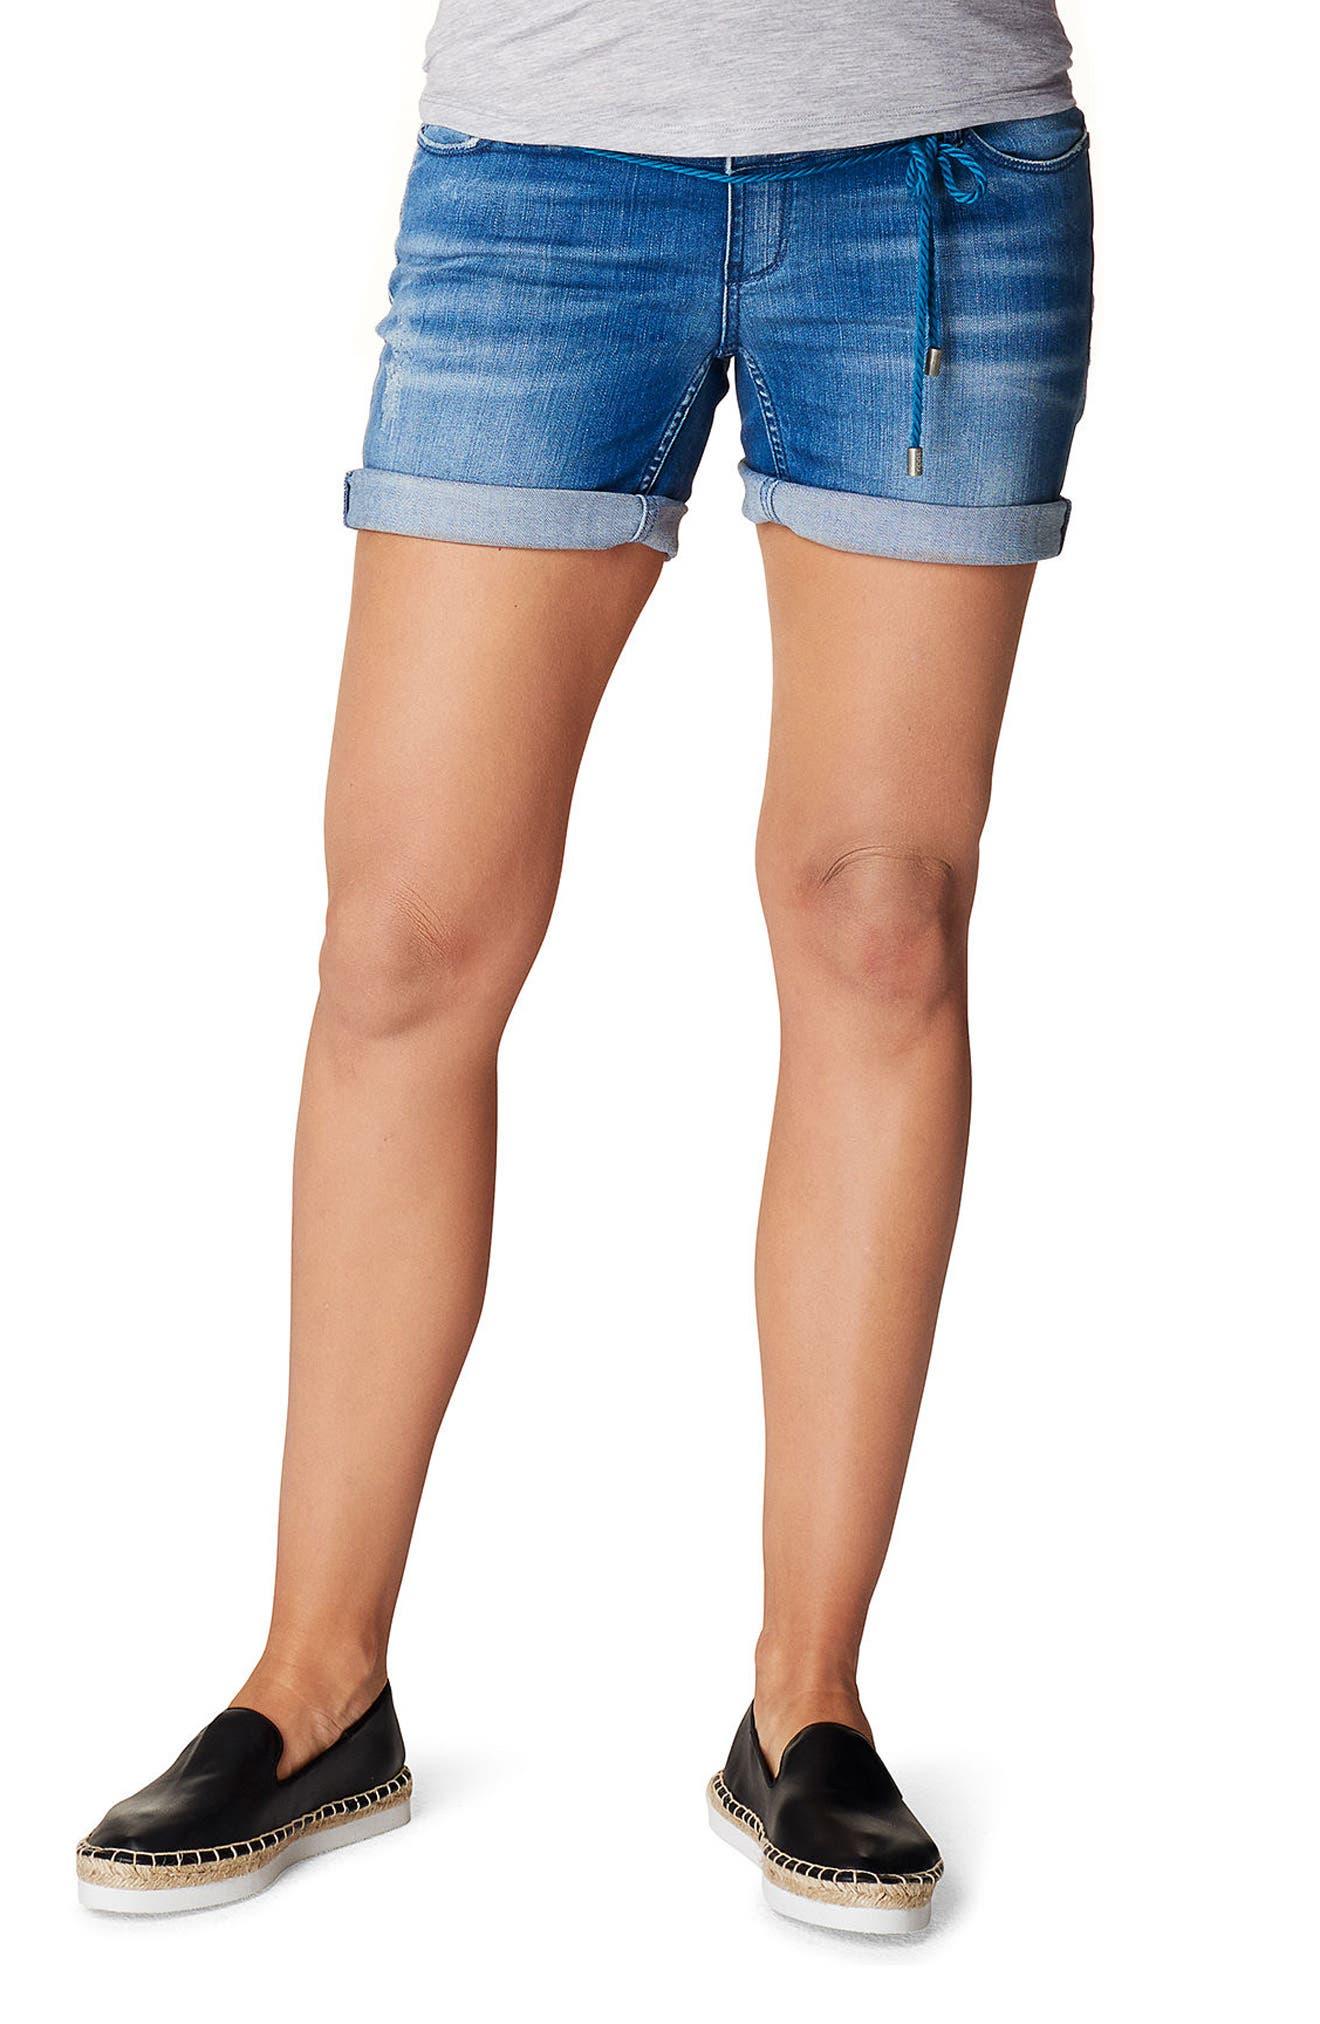 Zita Maternity Jean Shorts,                             Main thumbnail 1, color,                             MID BLUE